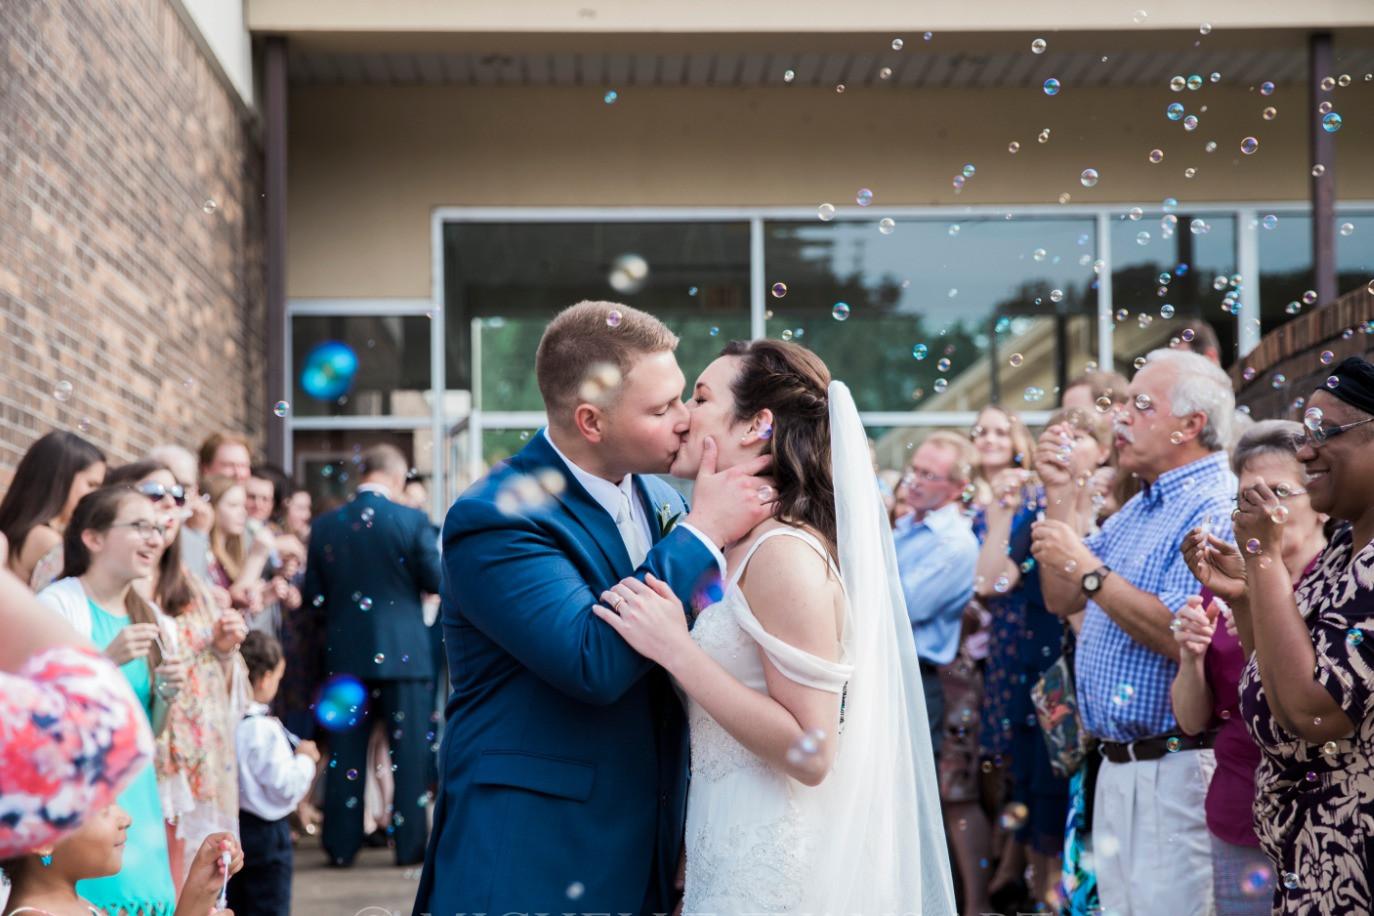 Memphis-Weddings-1_edited.jpg